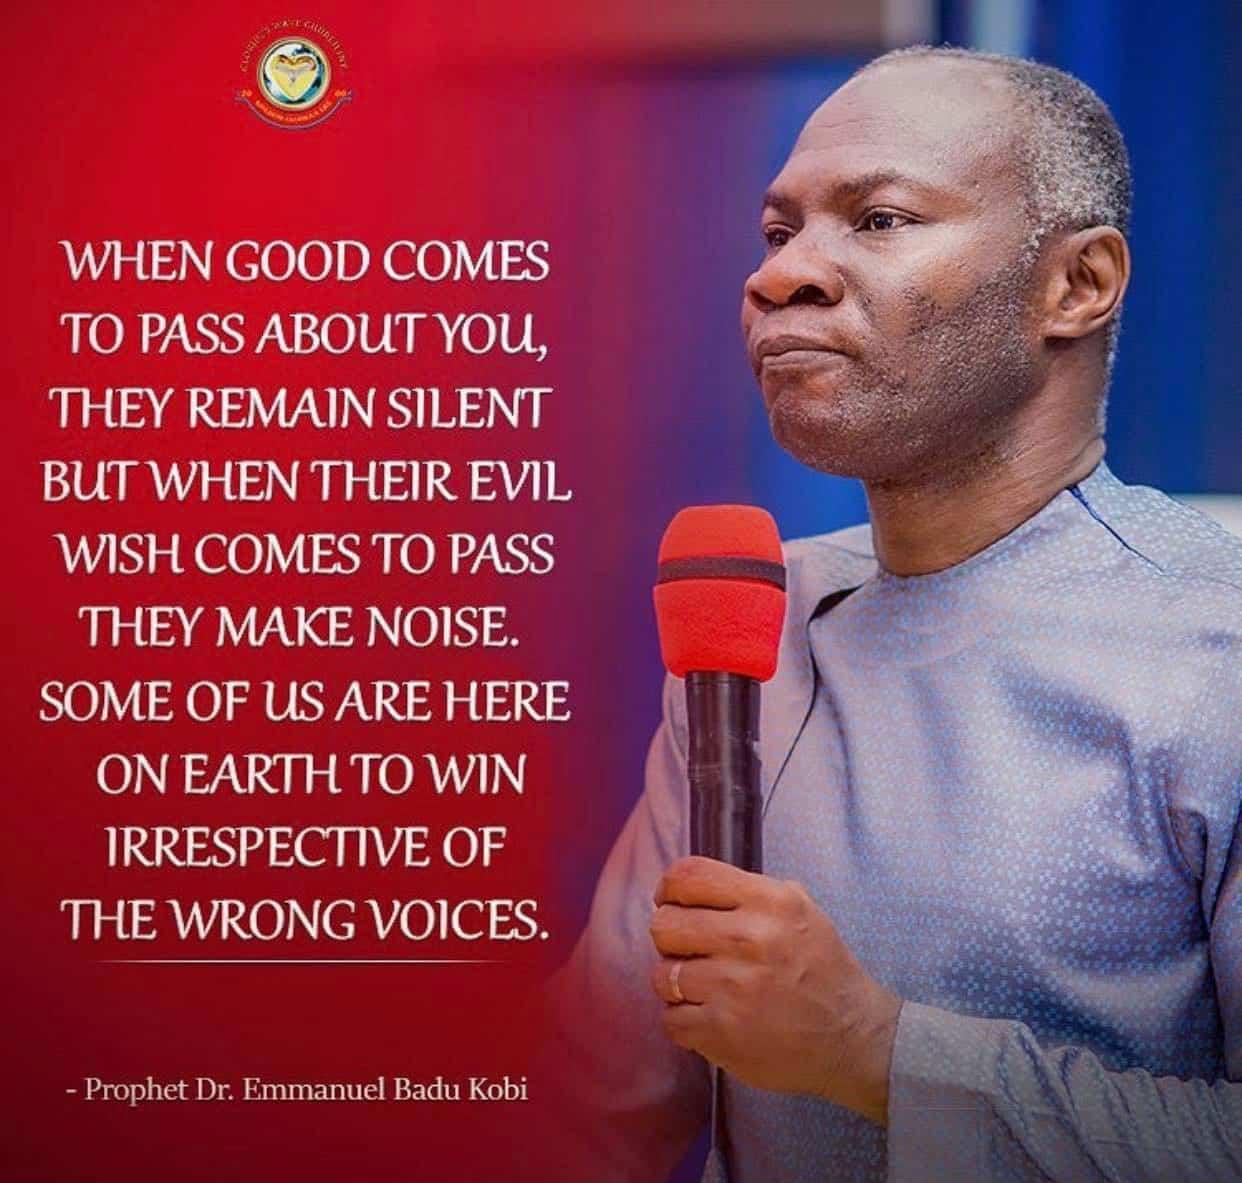 Badu Kobi reacts to the failed football prophecies